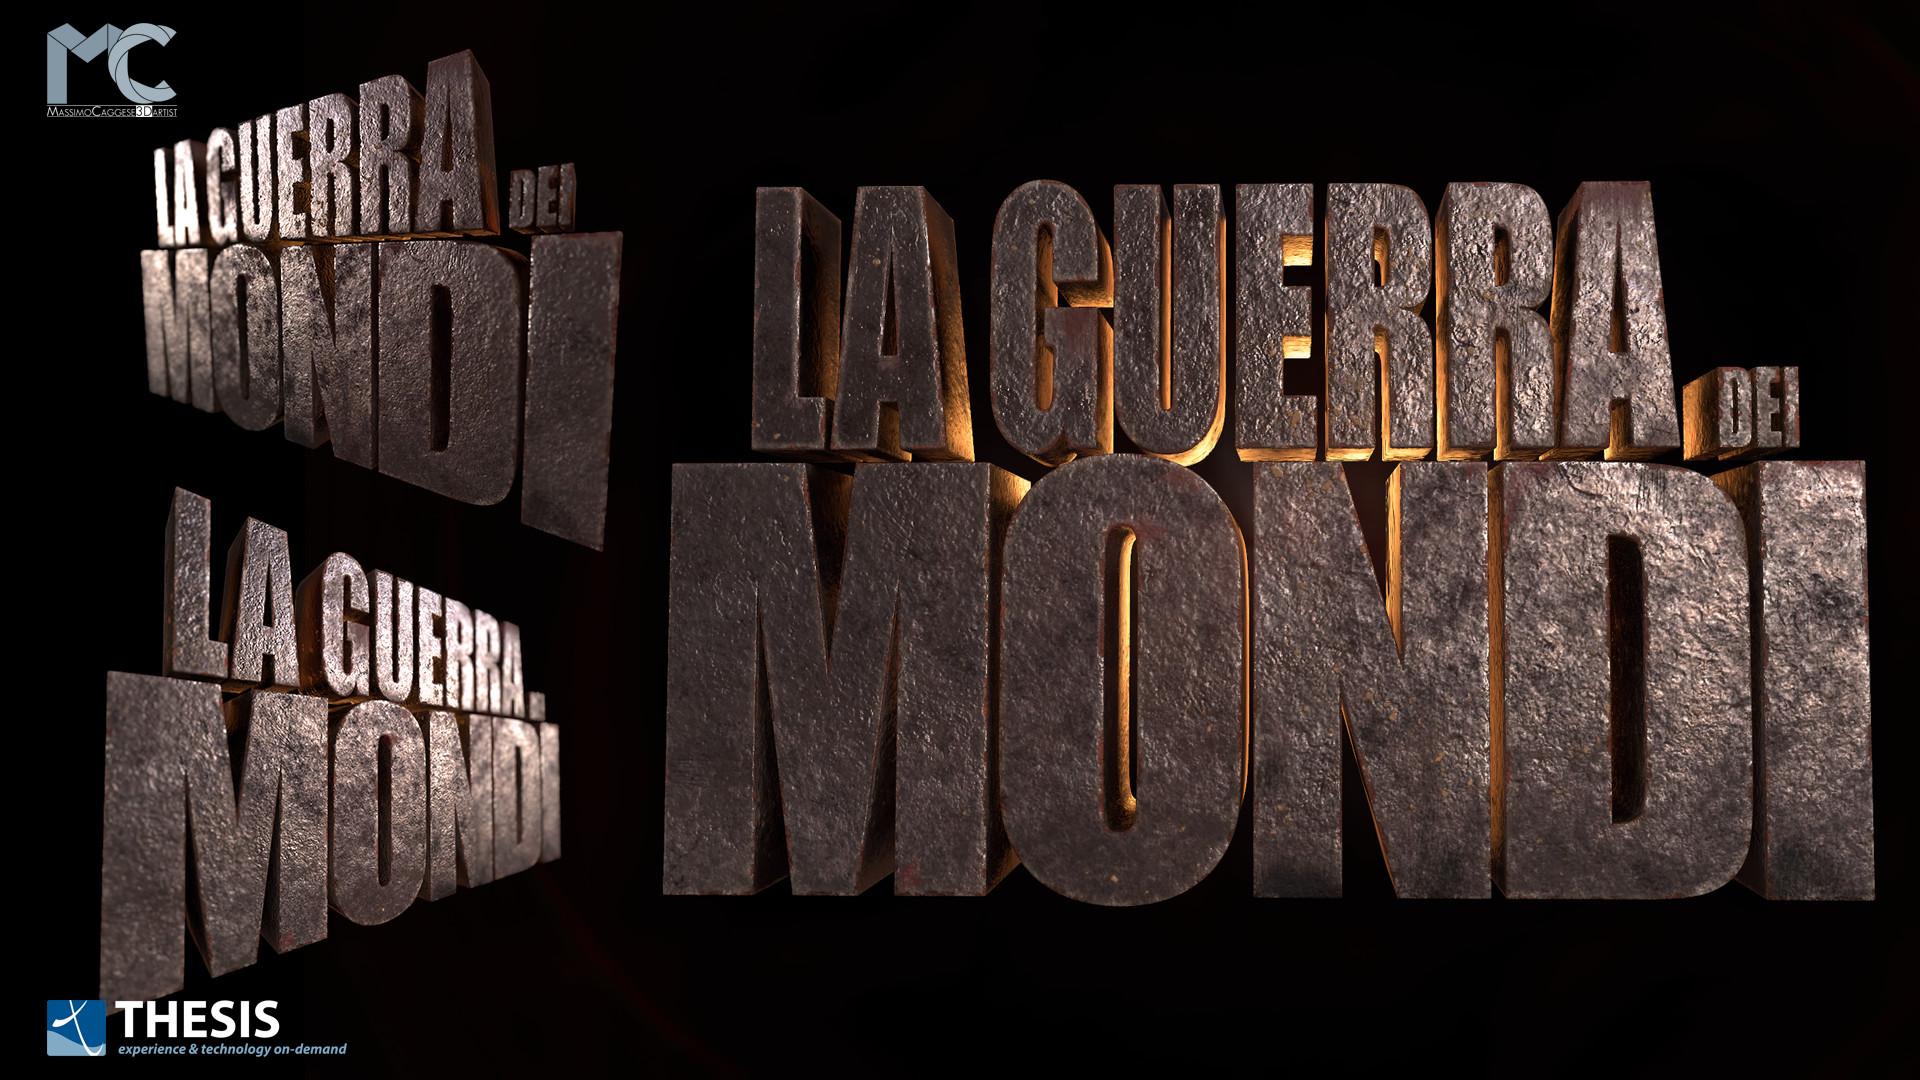 'La Guerra dei Mondi' title-art (Marmoset Toolbag 3).